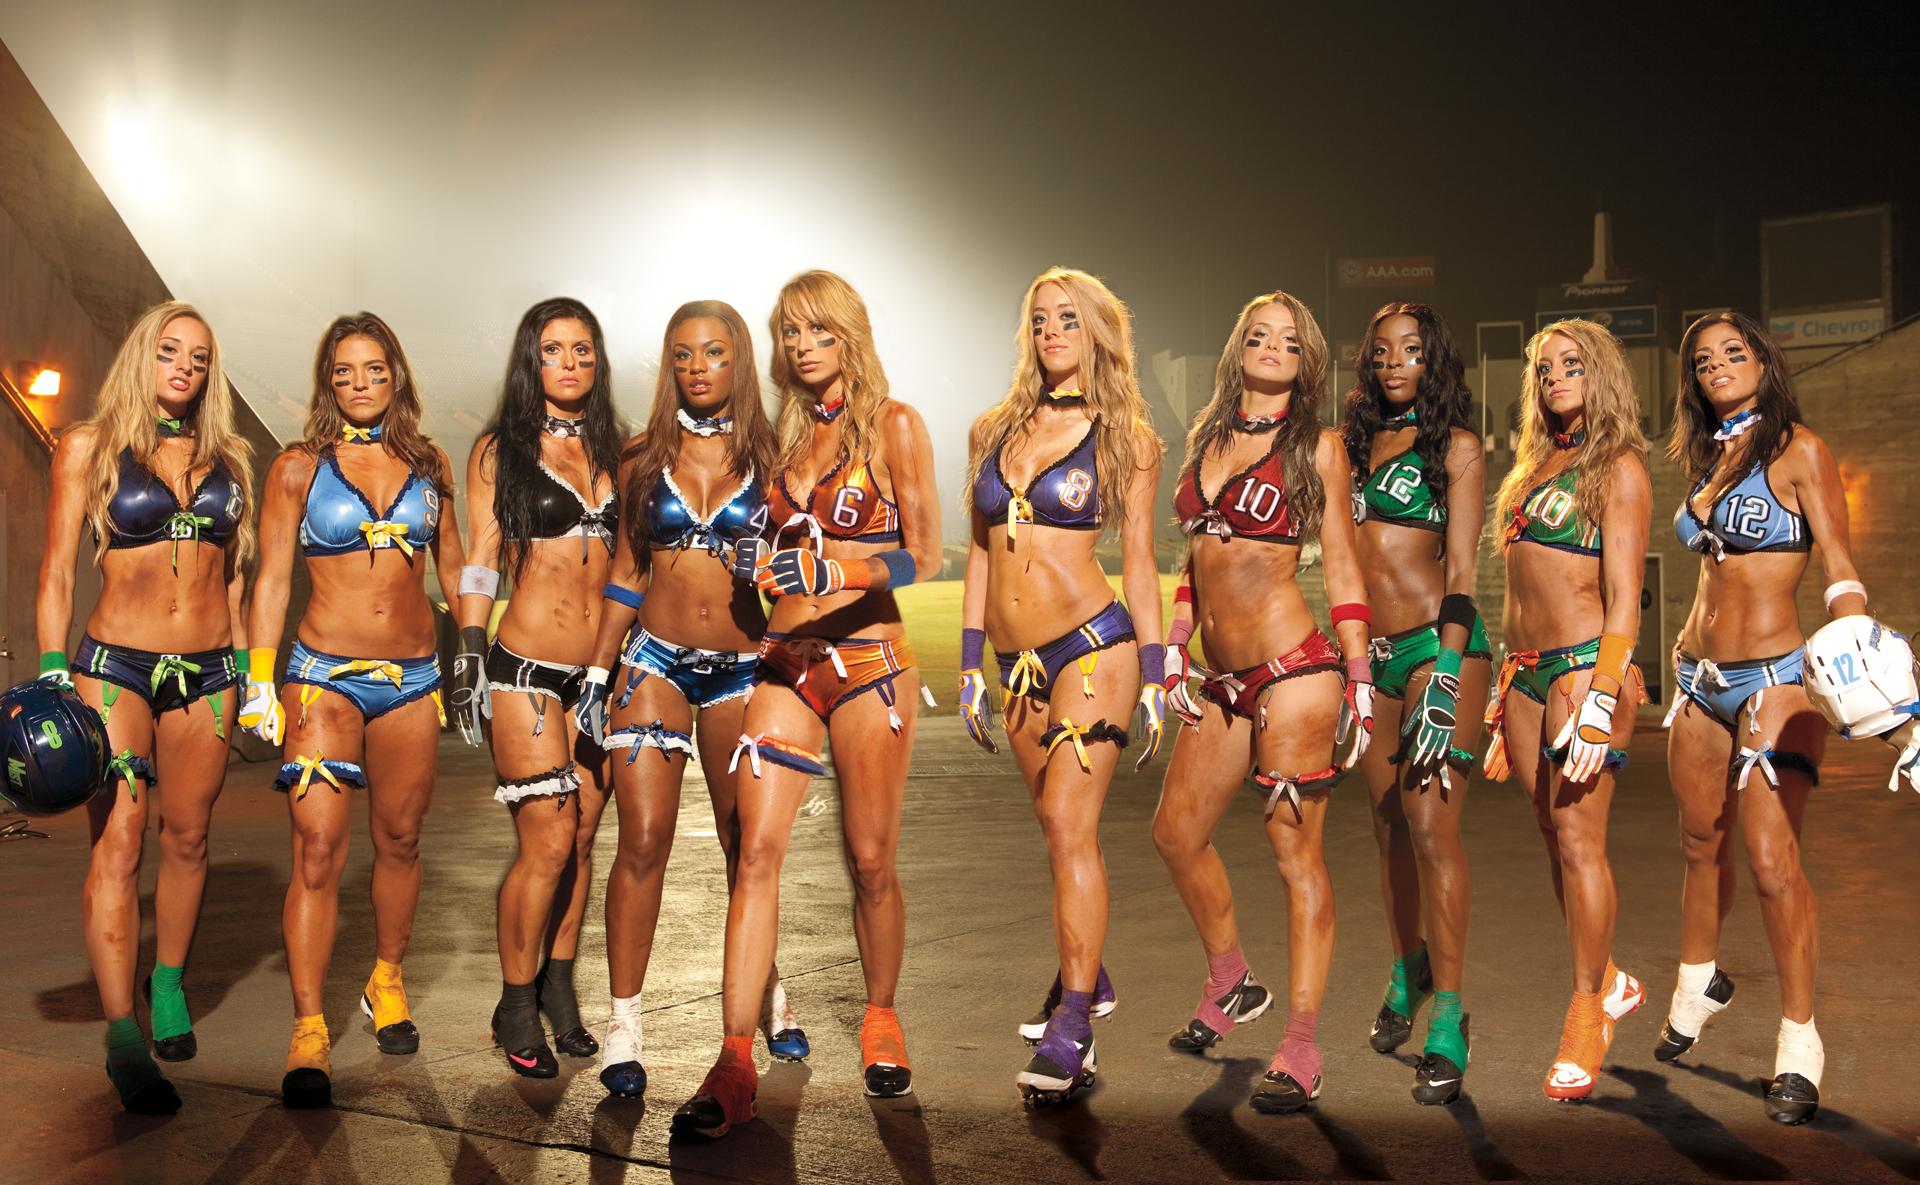 Lingerie football league women nude can